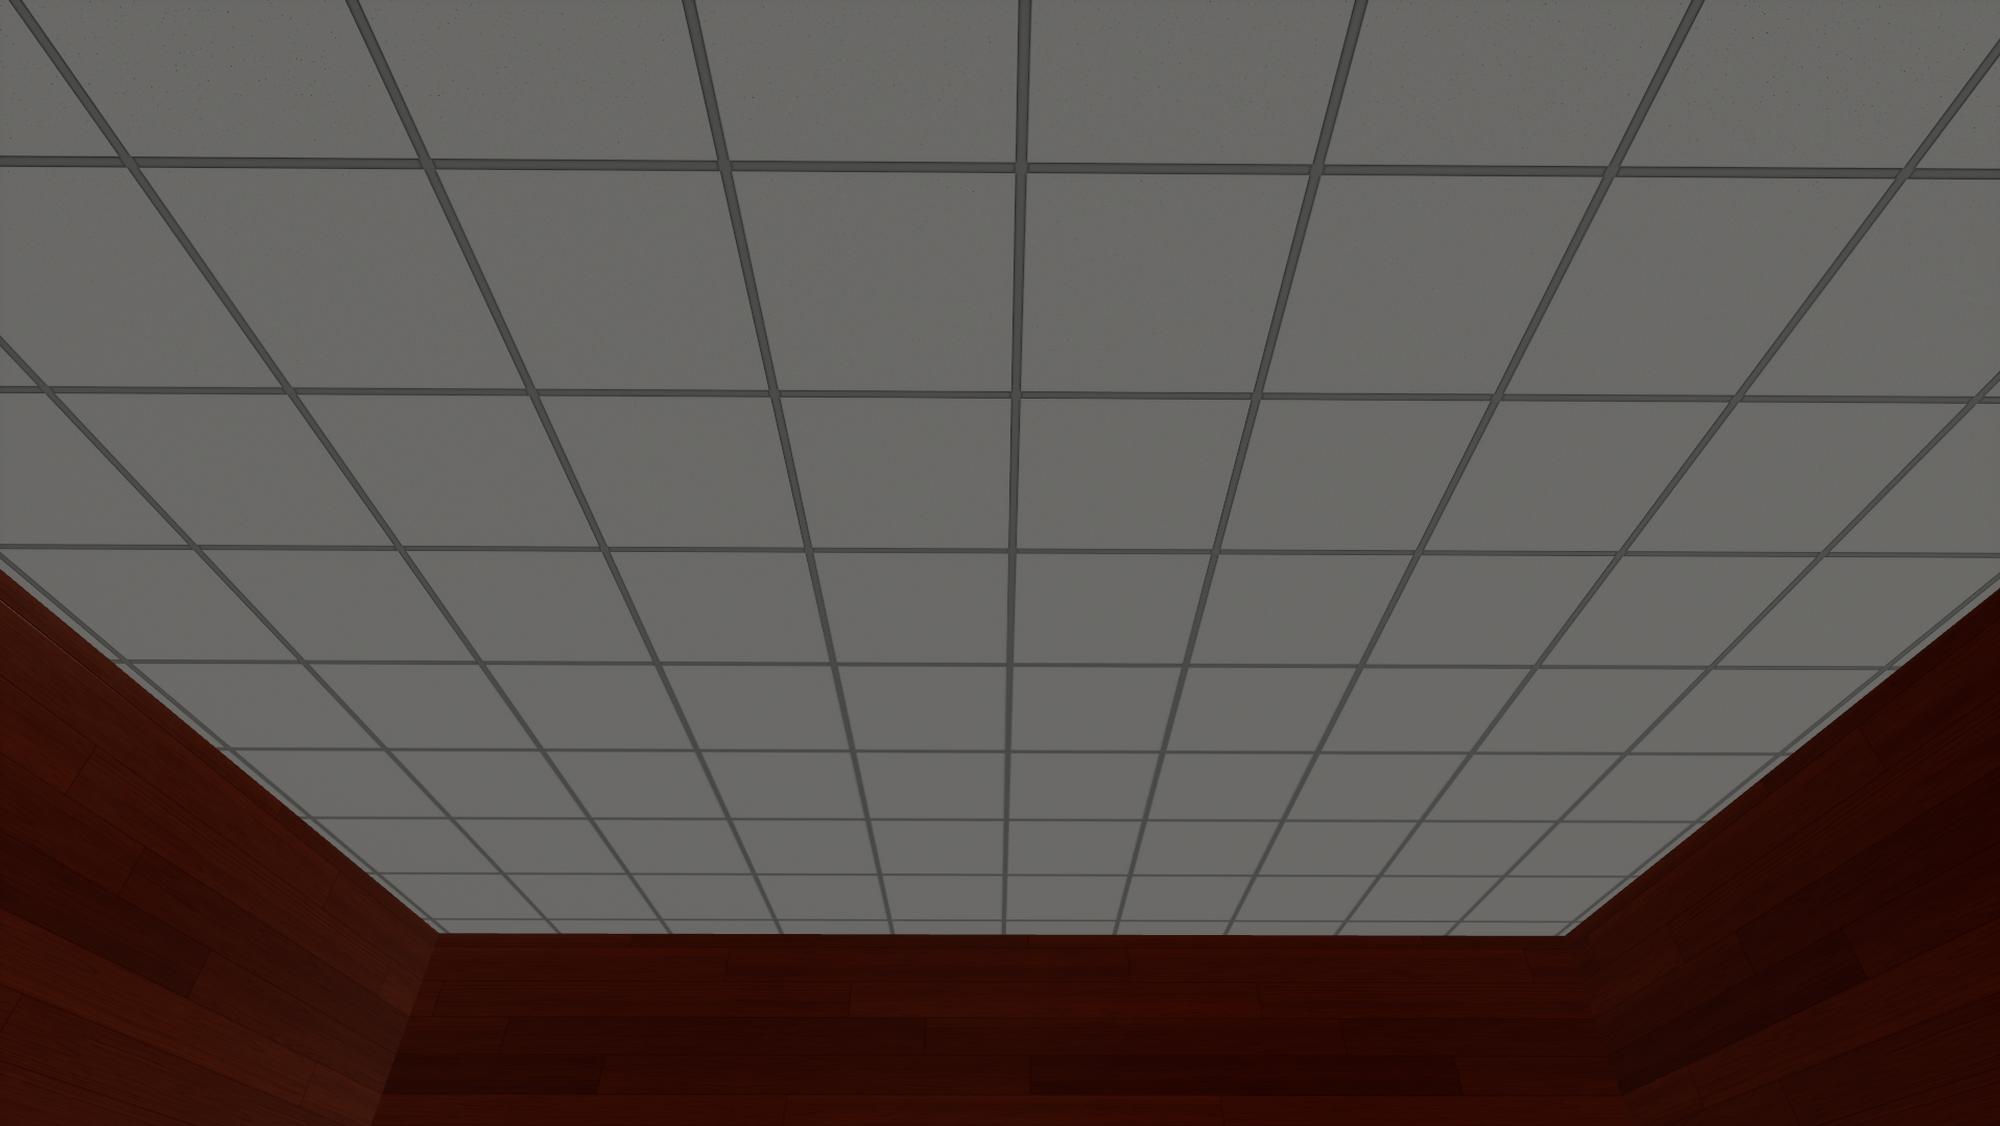 2x2 drop ceiling